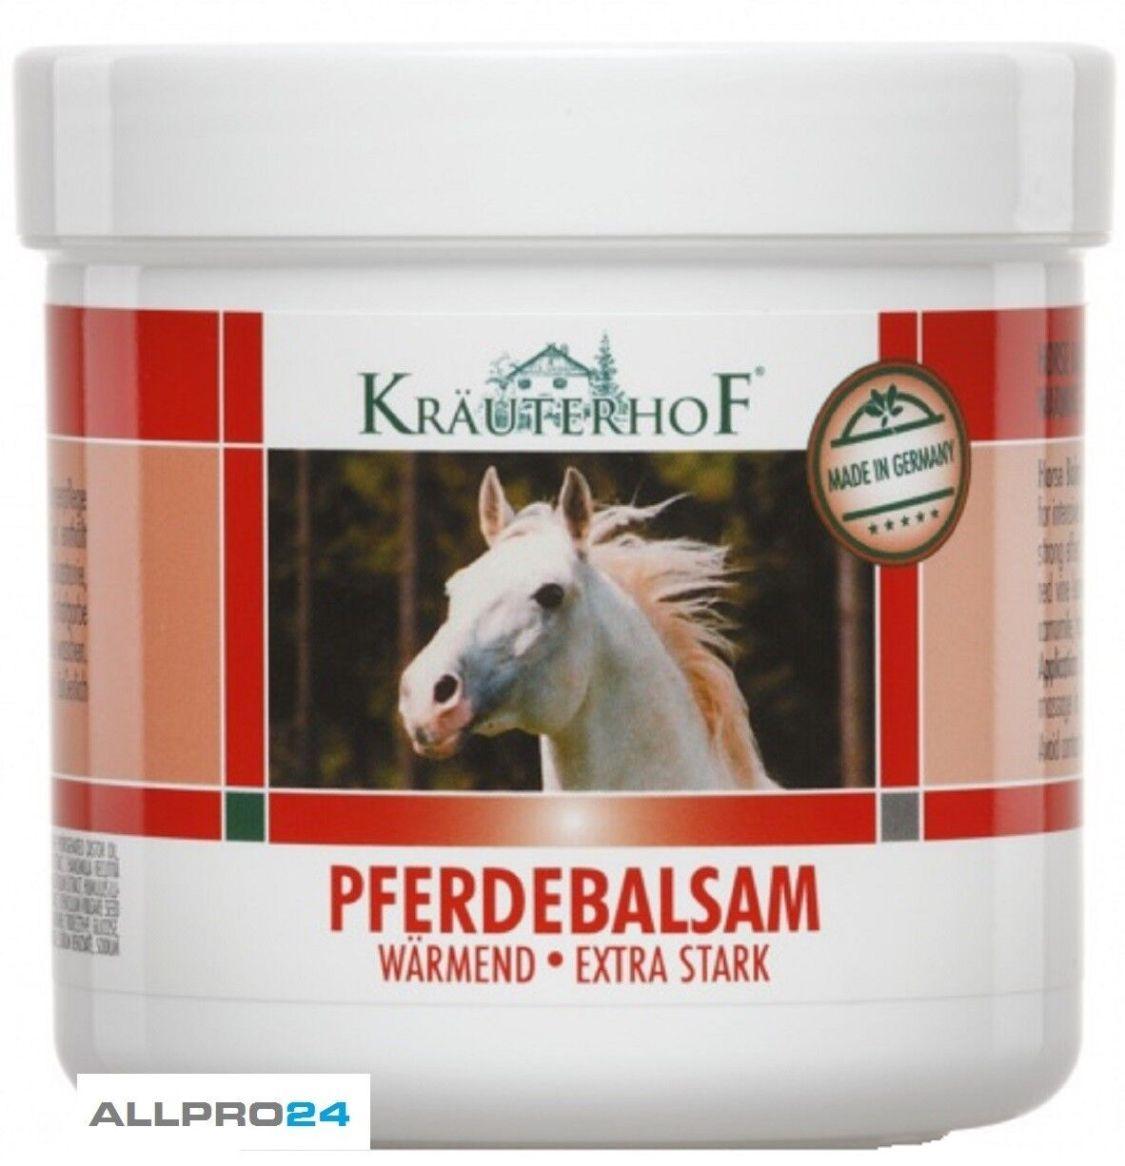 Pferdebalsam Sportgel Pferdesalbe Pferde Balsam Creme wärmend mit Mengenrabatt